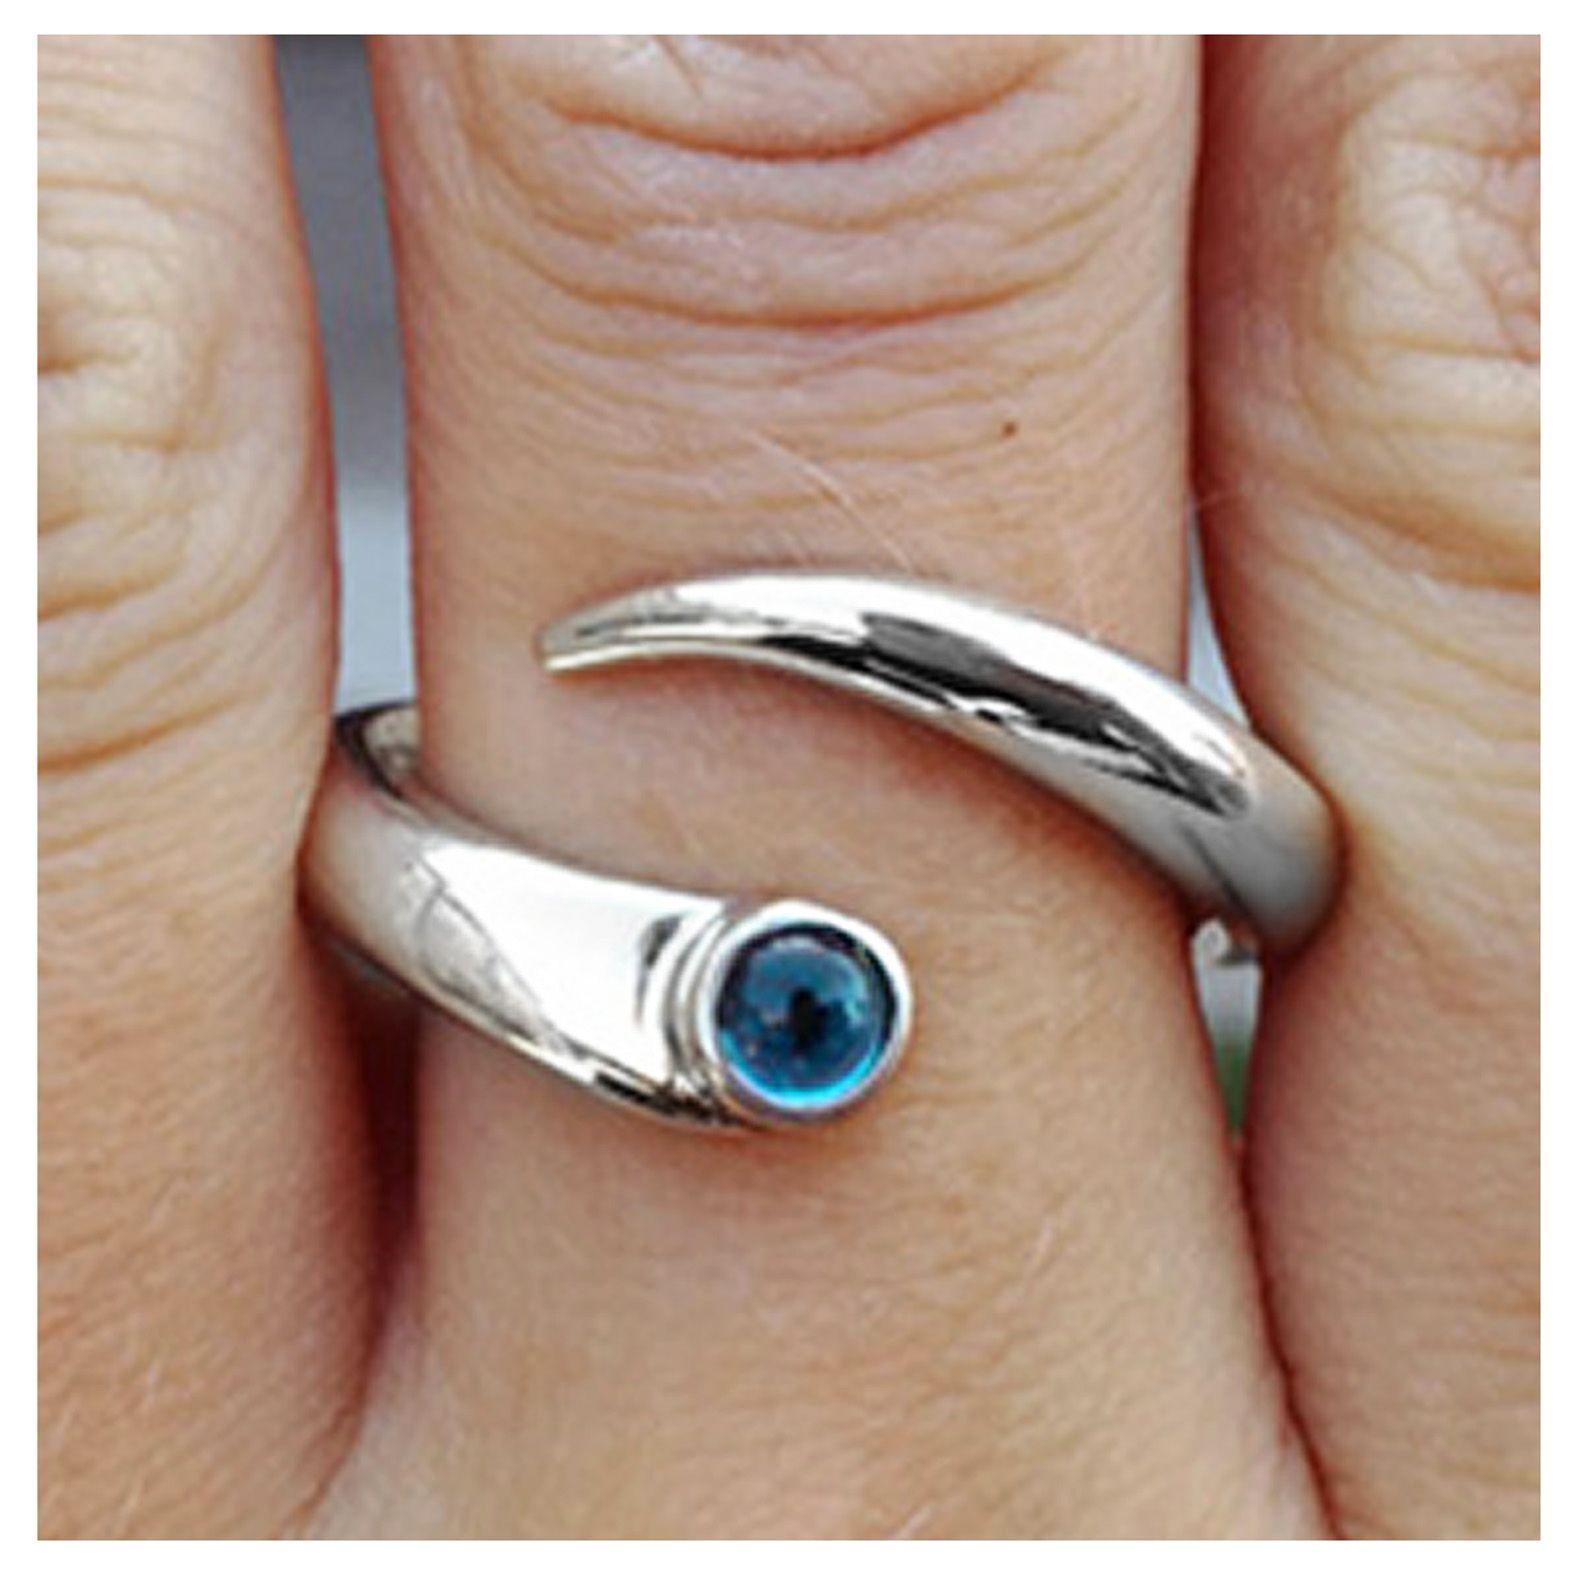 Curving silver ring with blue topaz #paulfinchjewellery #silverrings #topazrings #contemporaryjewellery #handmaderings